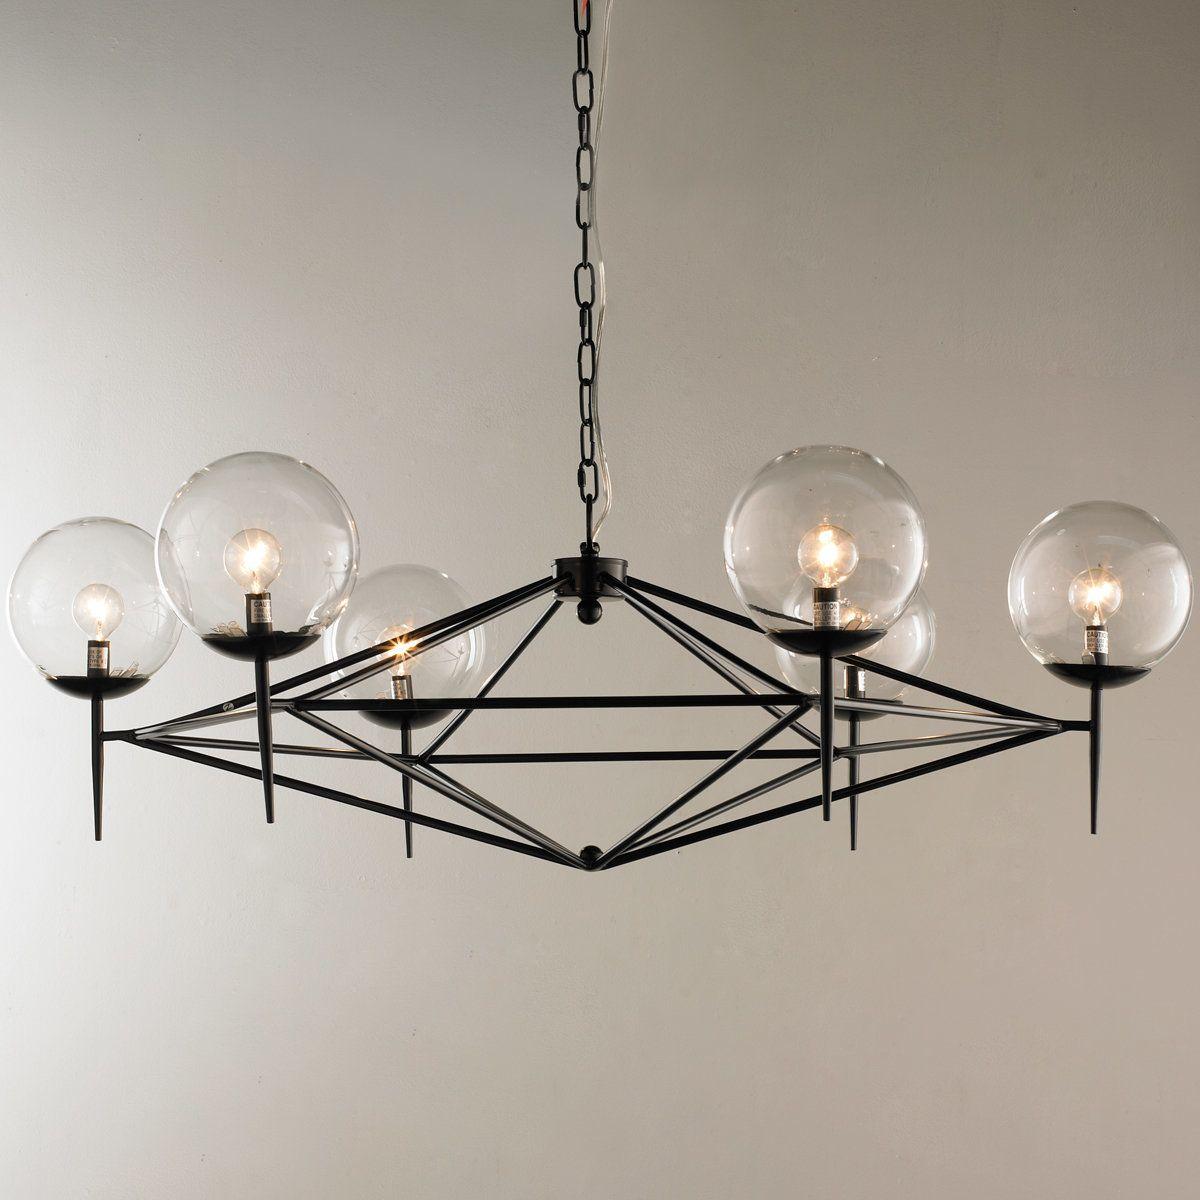 Hgtv Home Cassandra Blown Glass Mini Pendant Modern: Modern Pyramid Glass Globes Chandelier